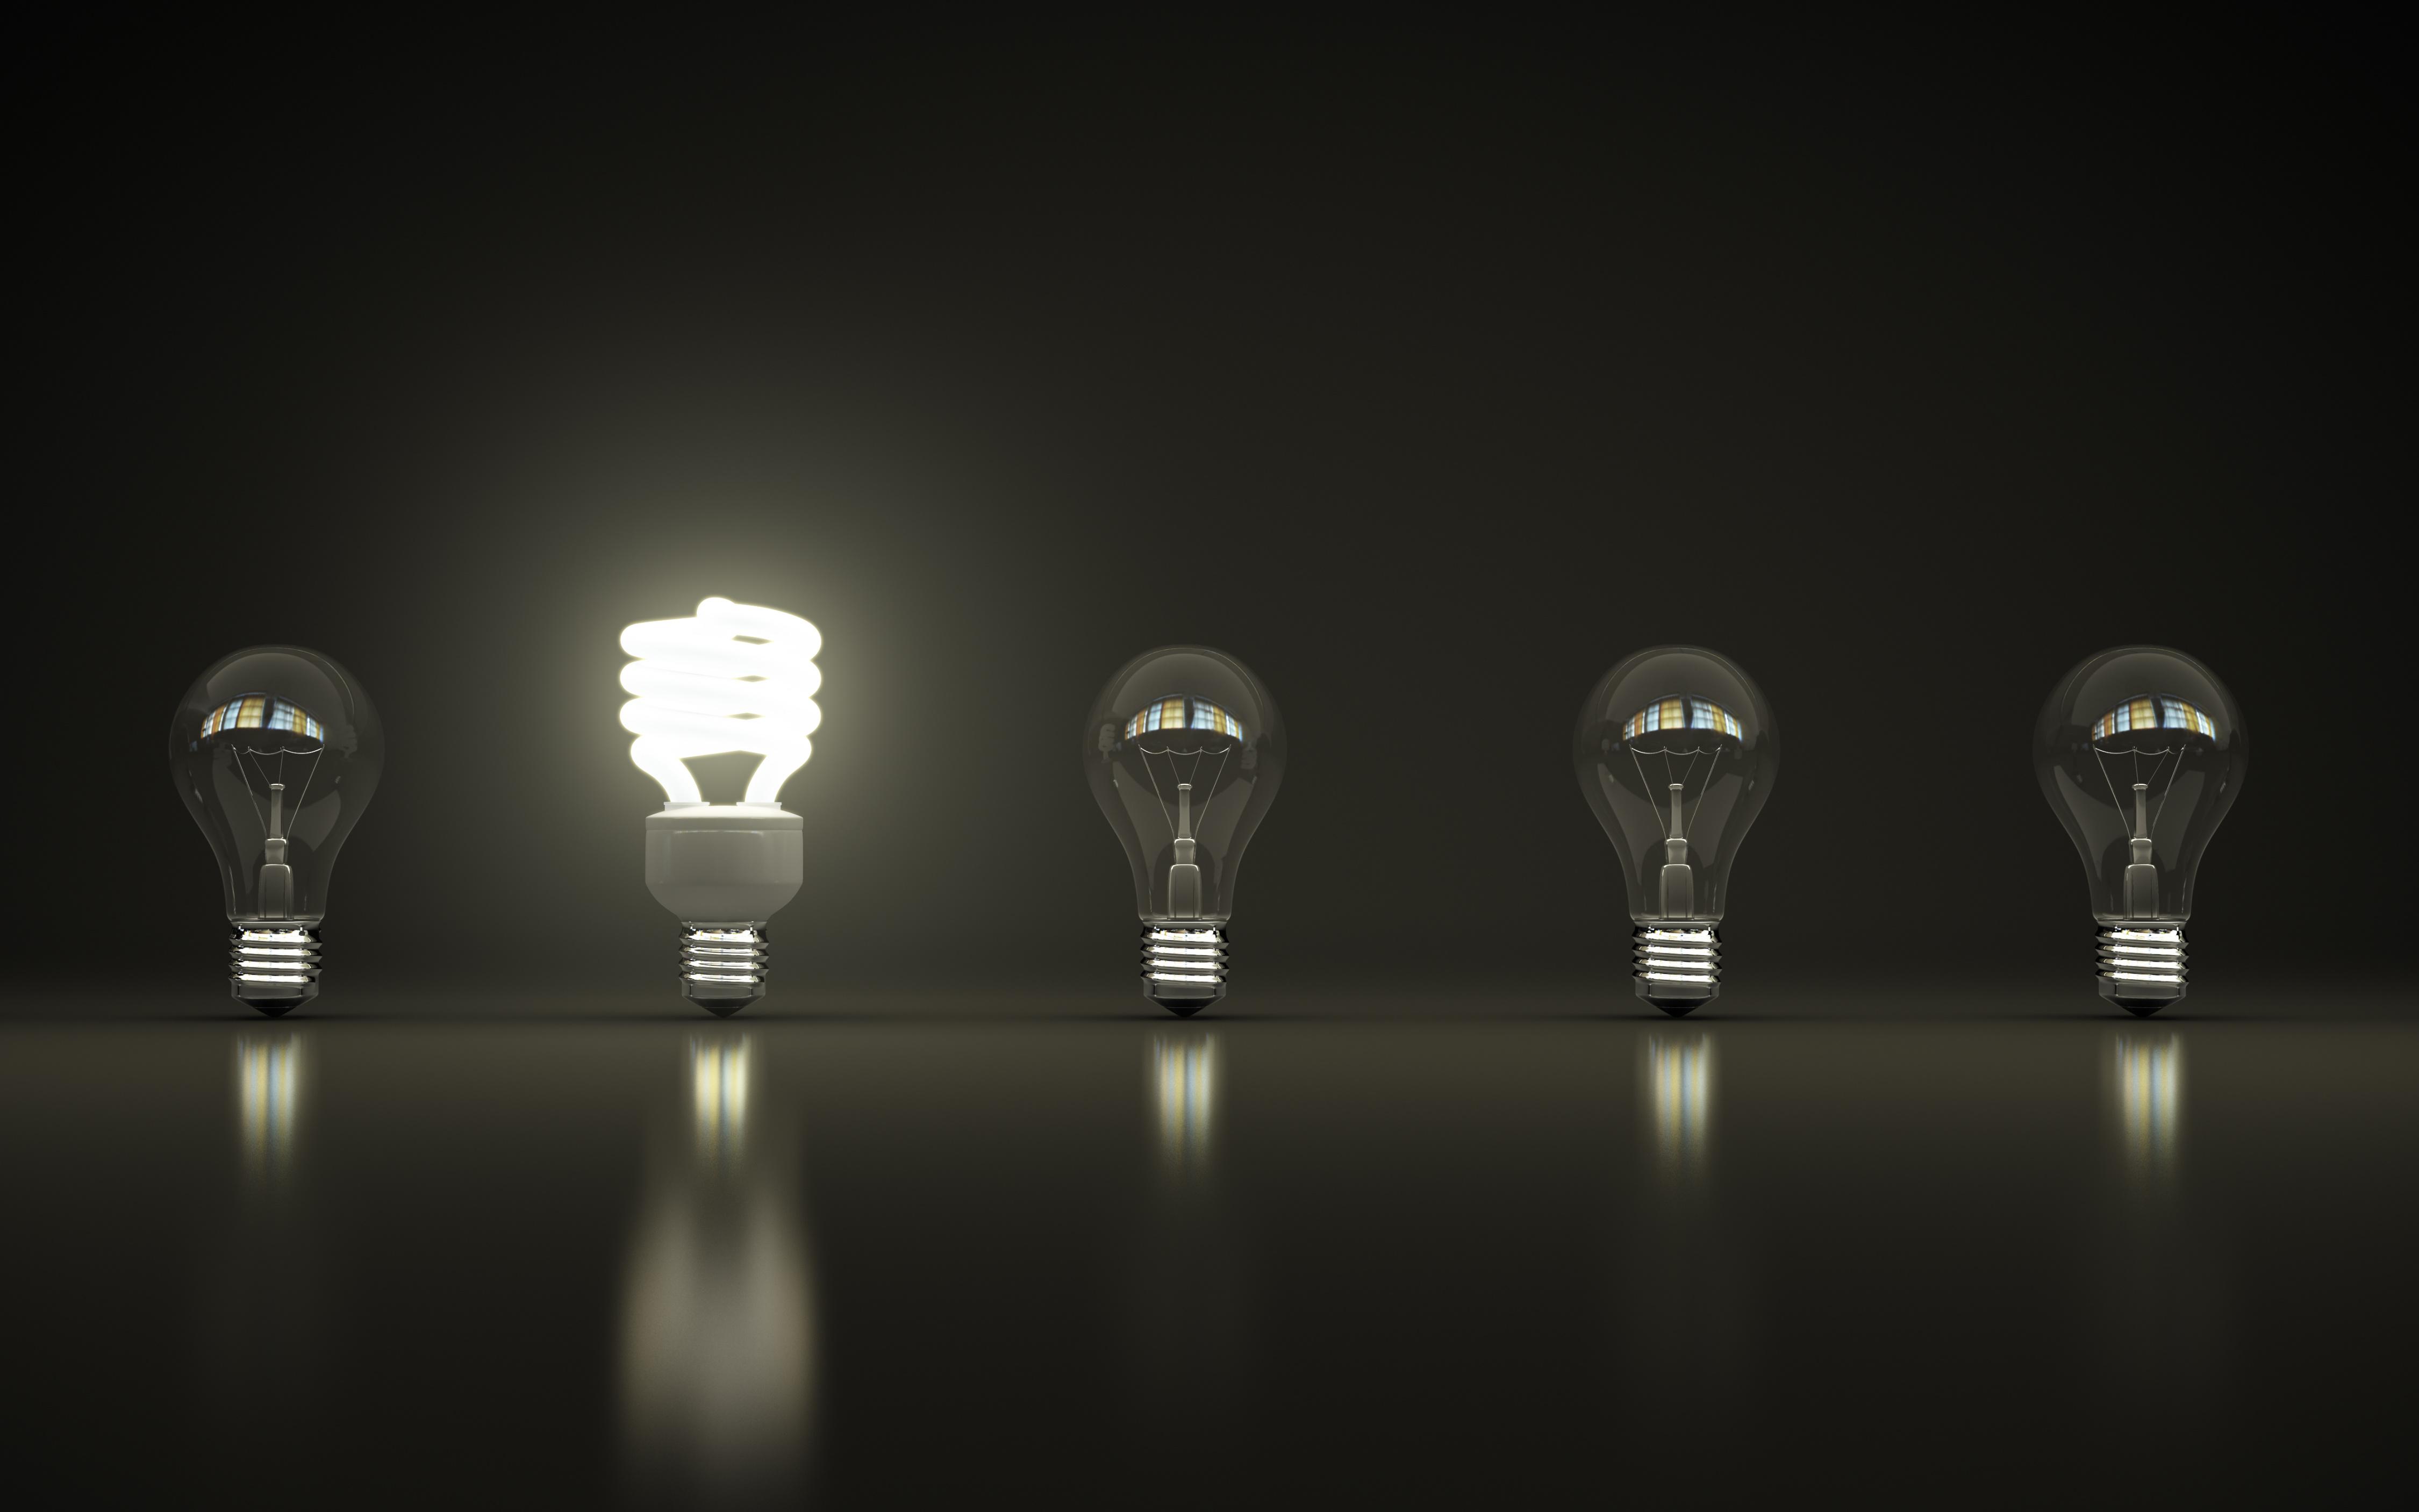 https://assets.sourcemedia.com/95/f4/fe62969c4172b88b152e6b36eb46/energy-conservation.jpeg